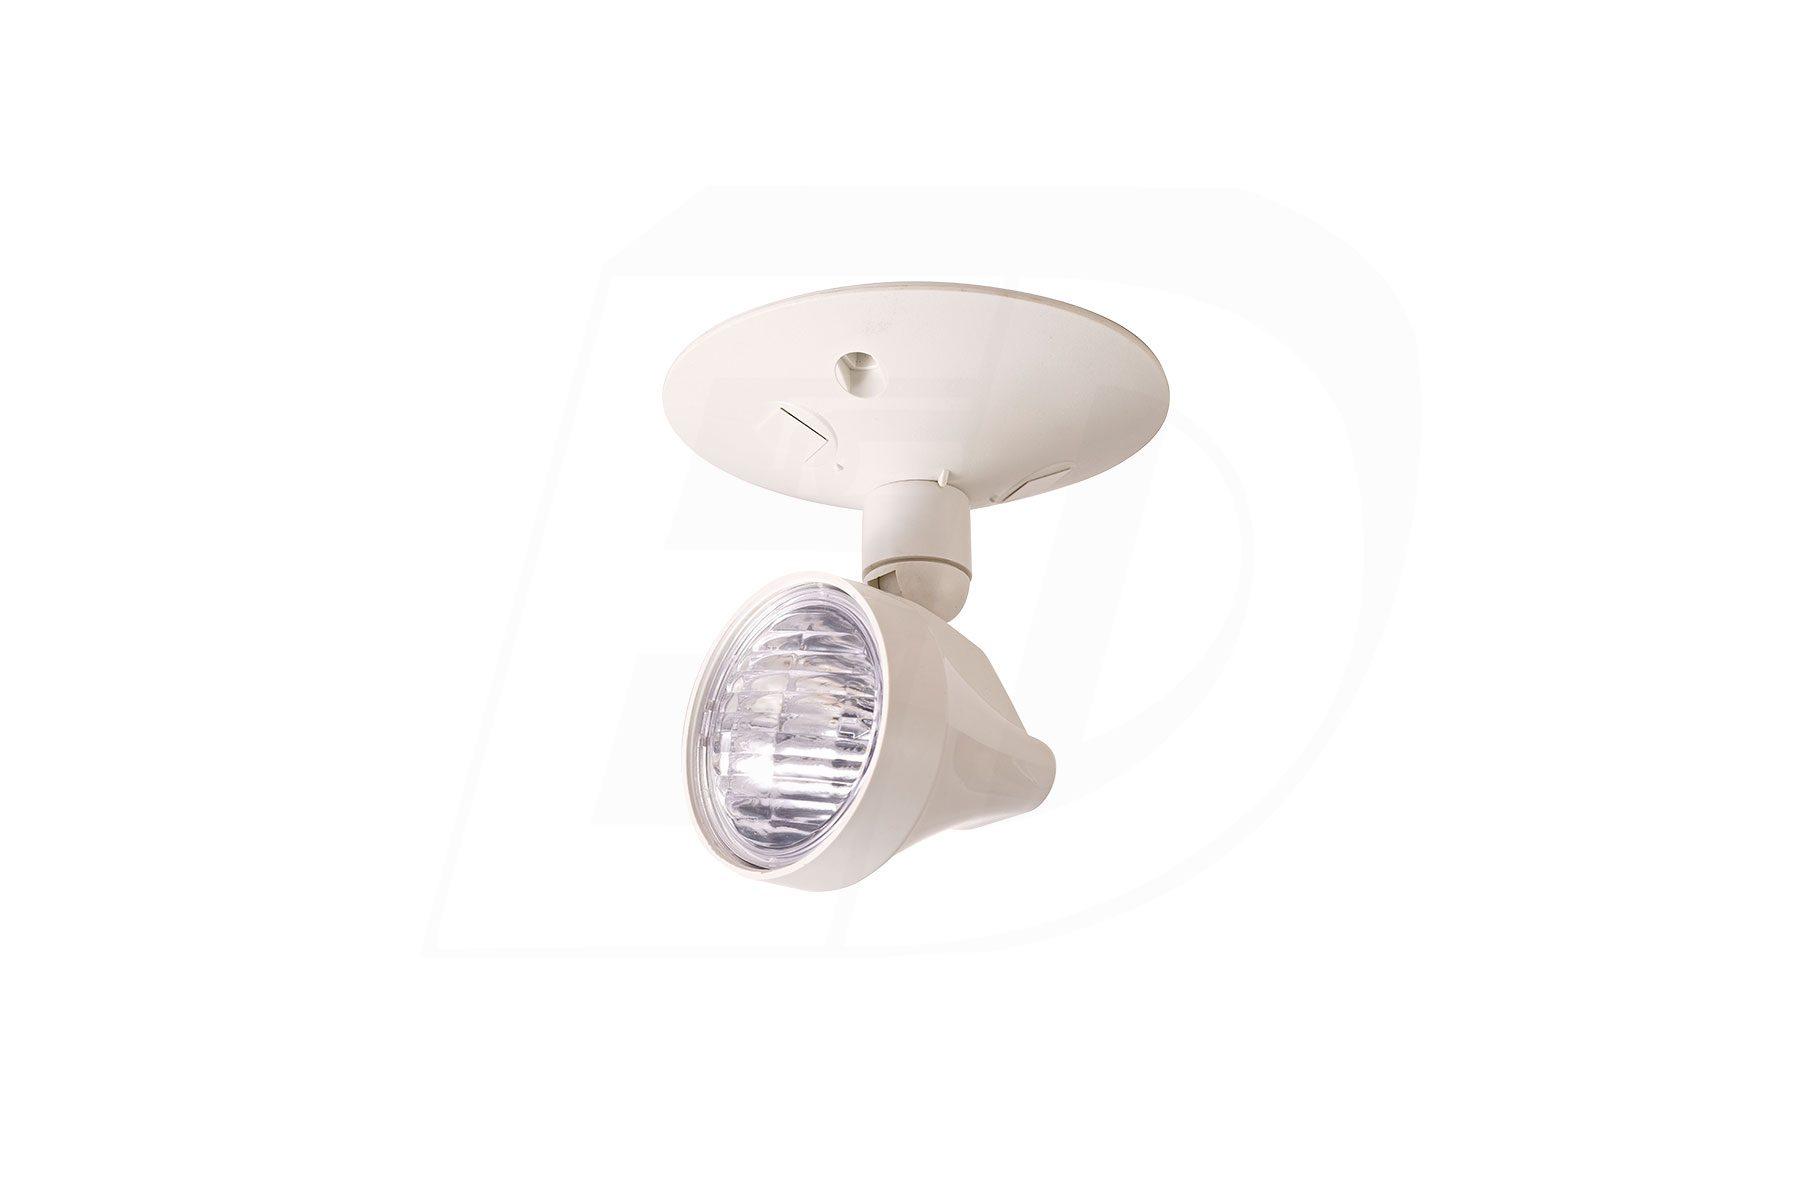 ER210SWH-UD1 - LED SINGLE REMOTE HEAD EMERGENCY LIGHT